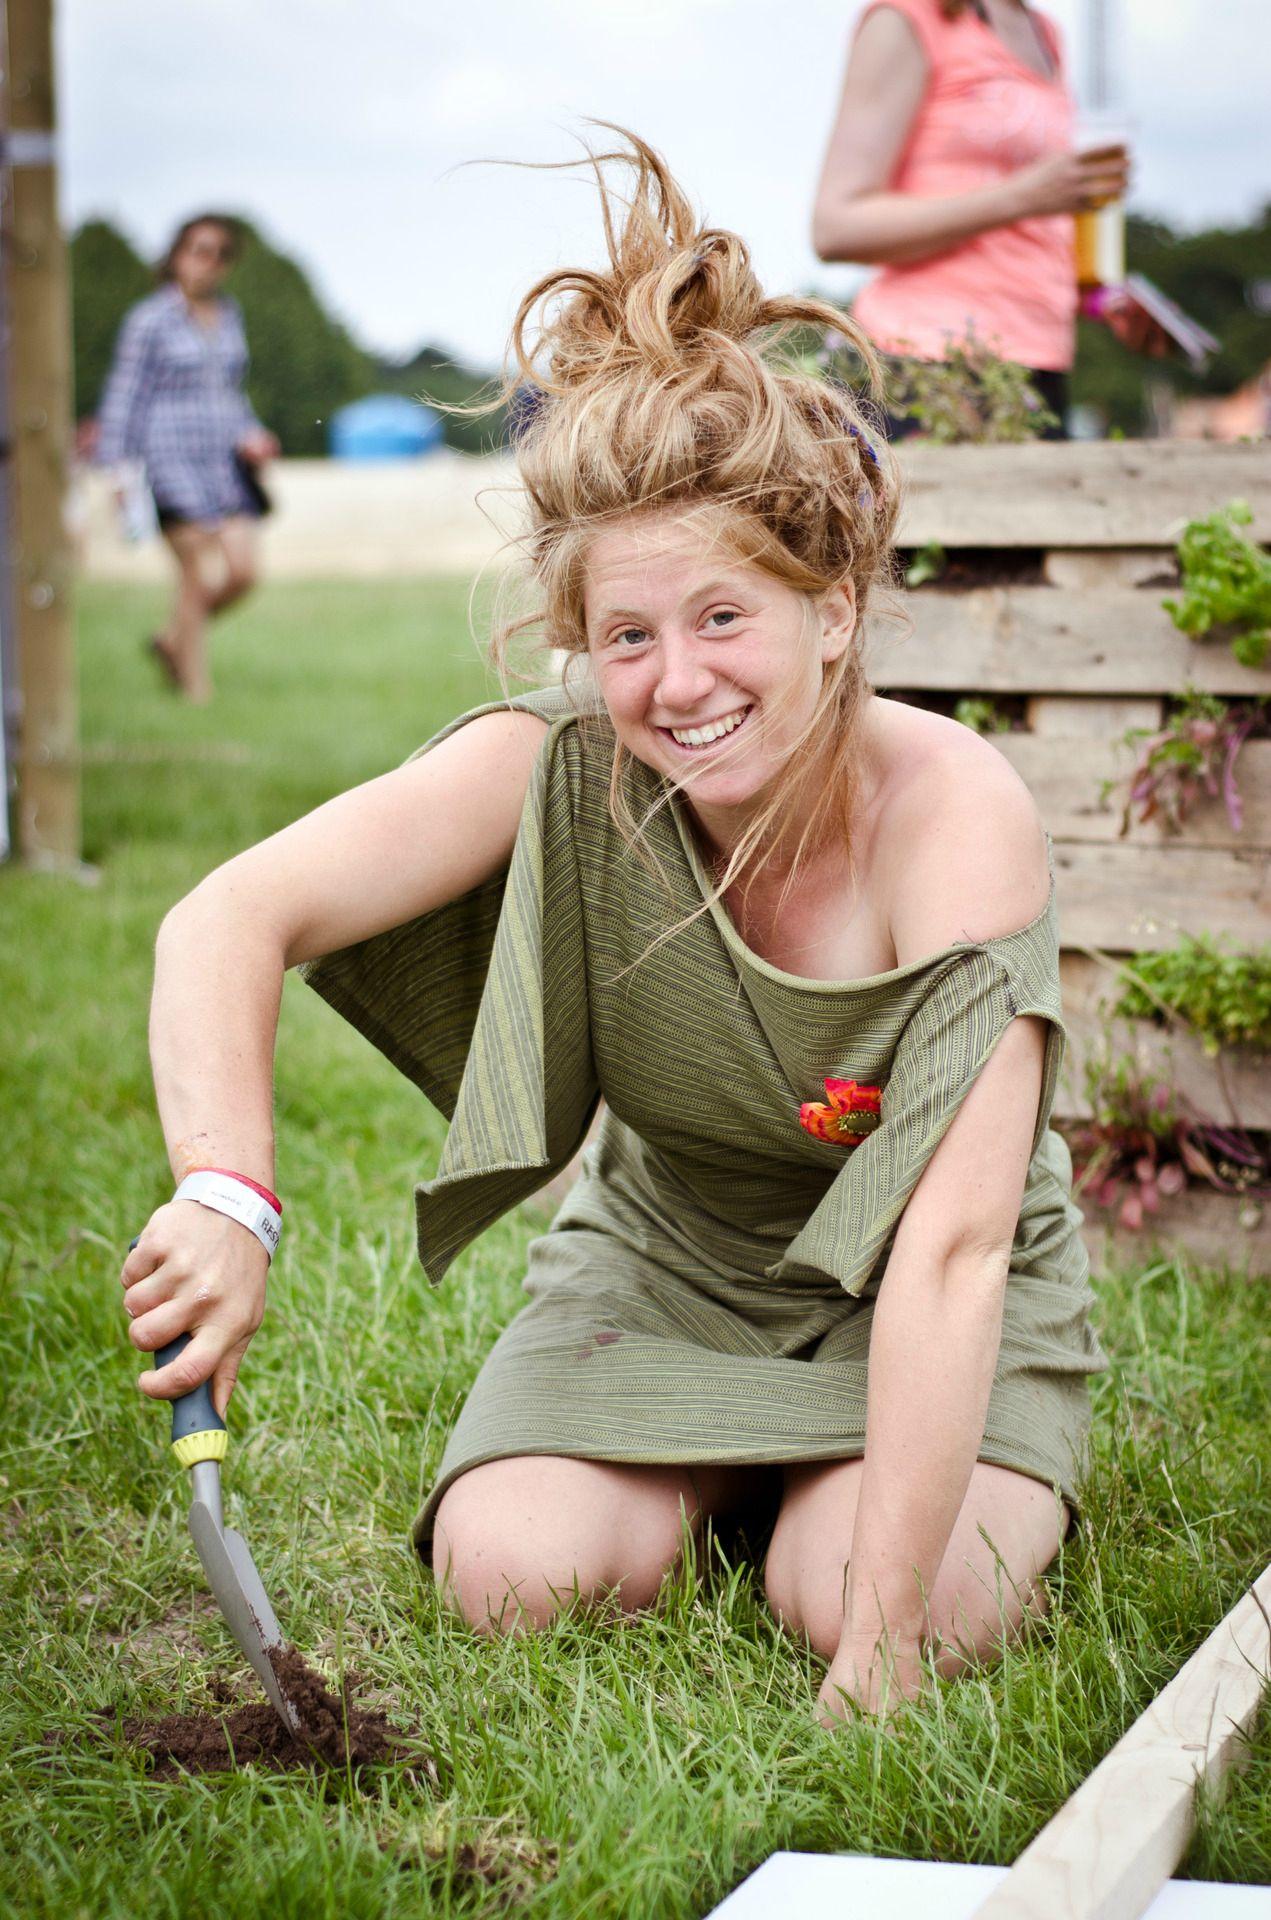 Maja, the guerrilla gardener